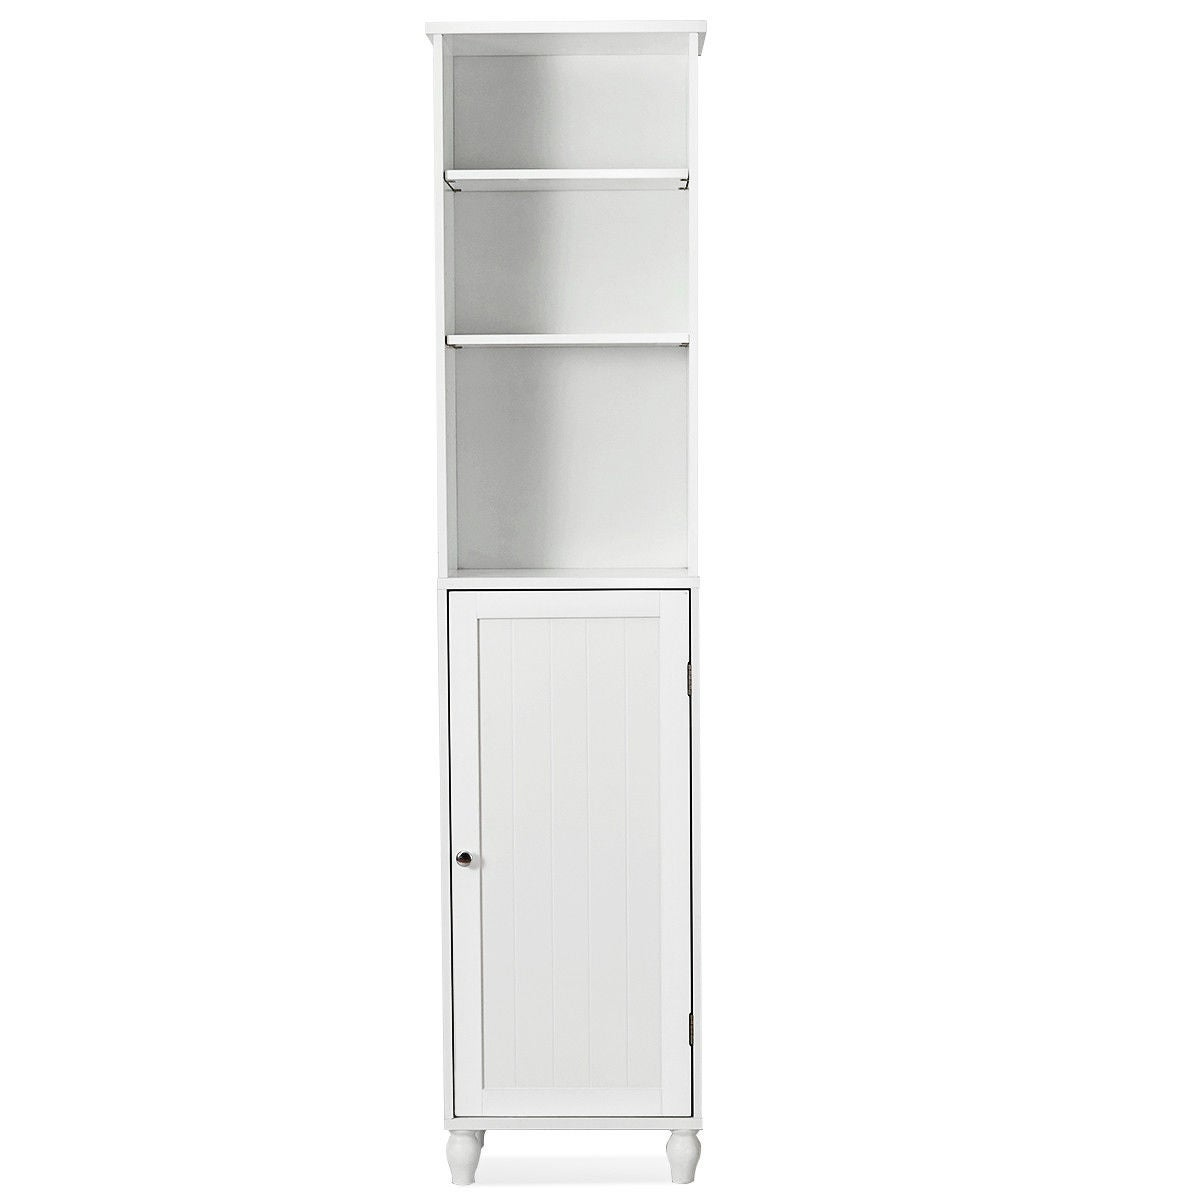 Costway Bathroom Storage Cabinet Tower Bath Shelving Display